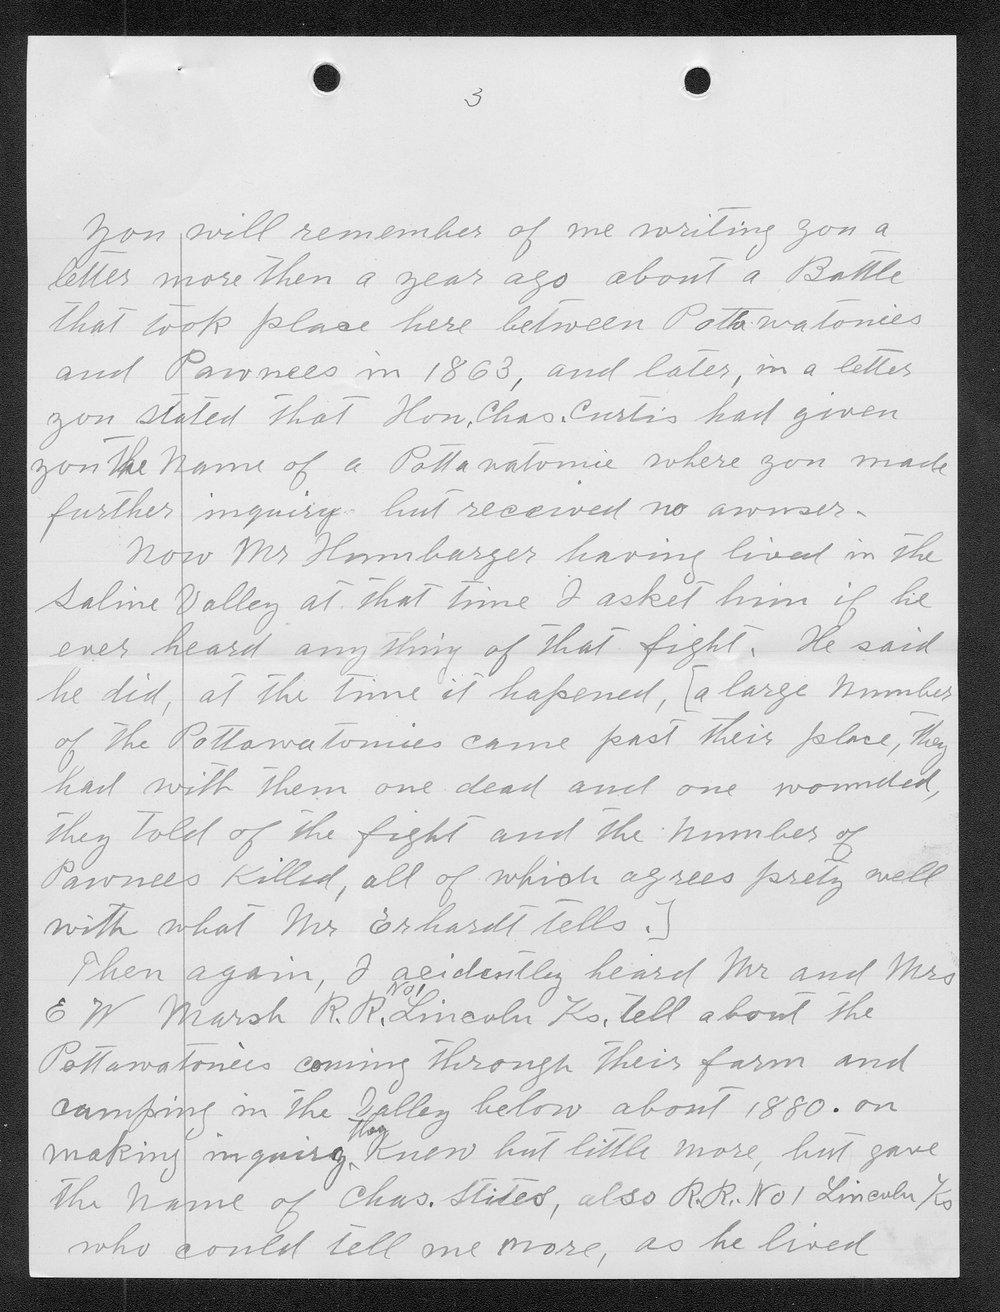 Adolph Roenigk and George W. Martin correspondence - 10